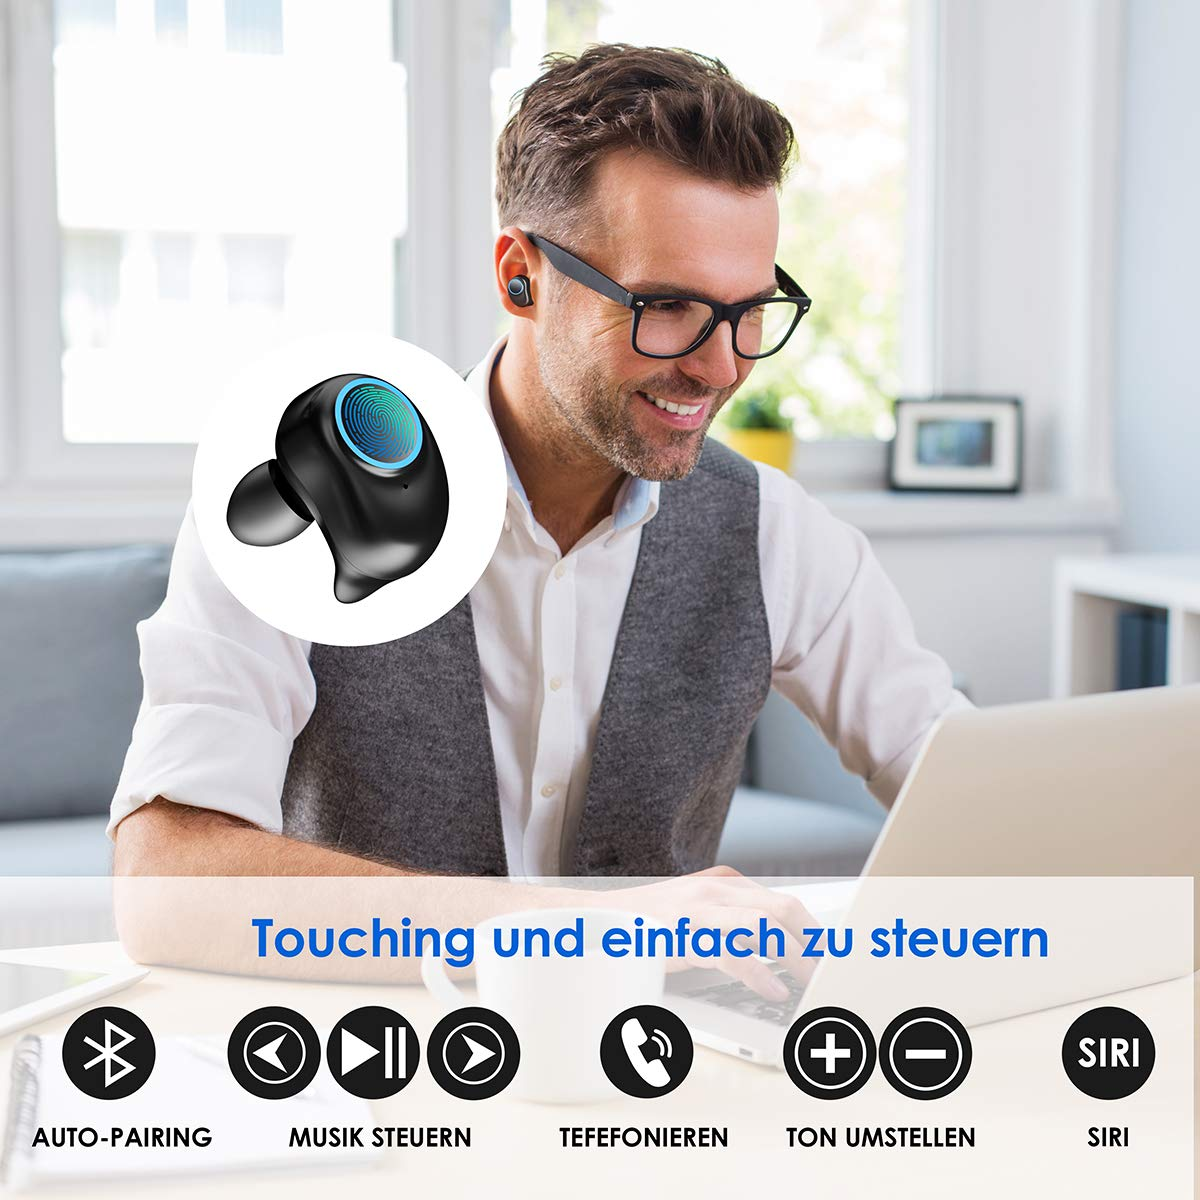 Bluetooth Kopfhörer, WU-MINGLU Bluetooth 5.0 Kopfhörer in Ears Kabellose HiFi Headset IPX5 Wasserdicht Ohrhörer Stereo-Sound Earbuds für alle Bluetooth Geräte, Sport, Entspannung